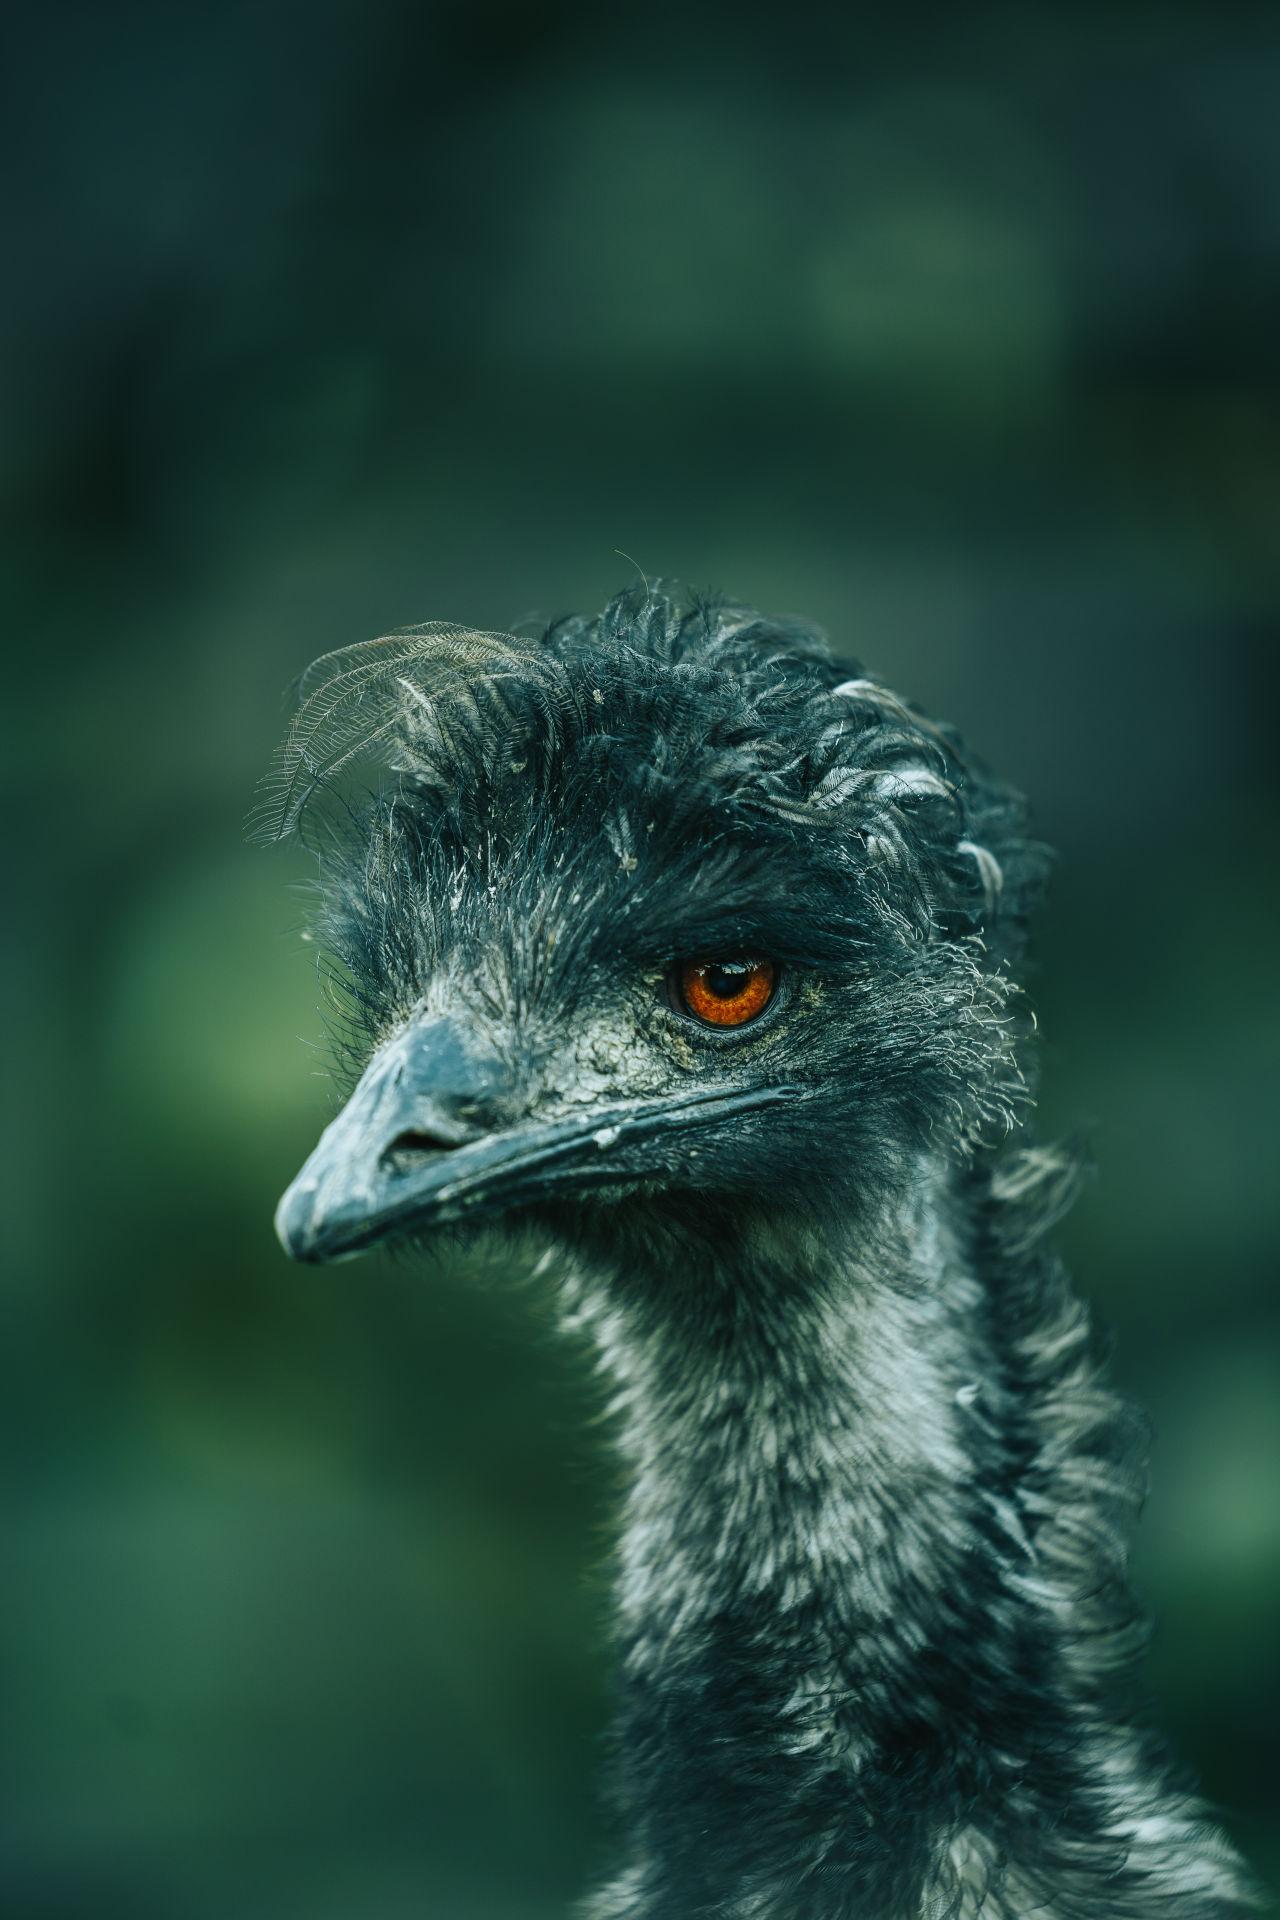 emu on a dark background, beak facing left